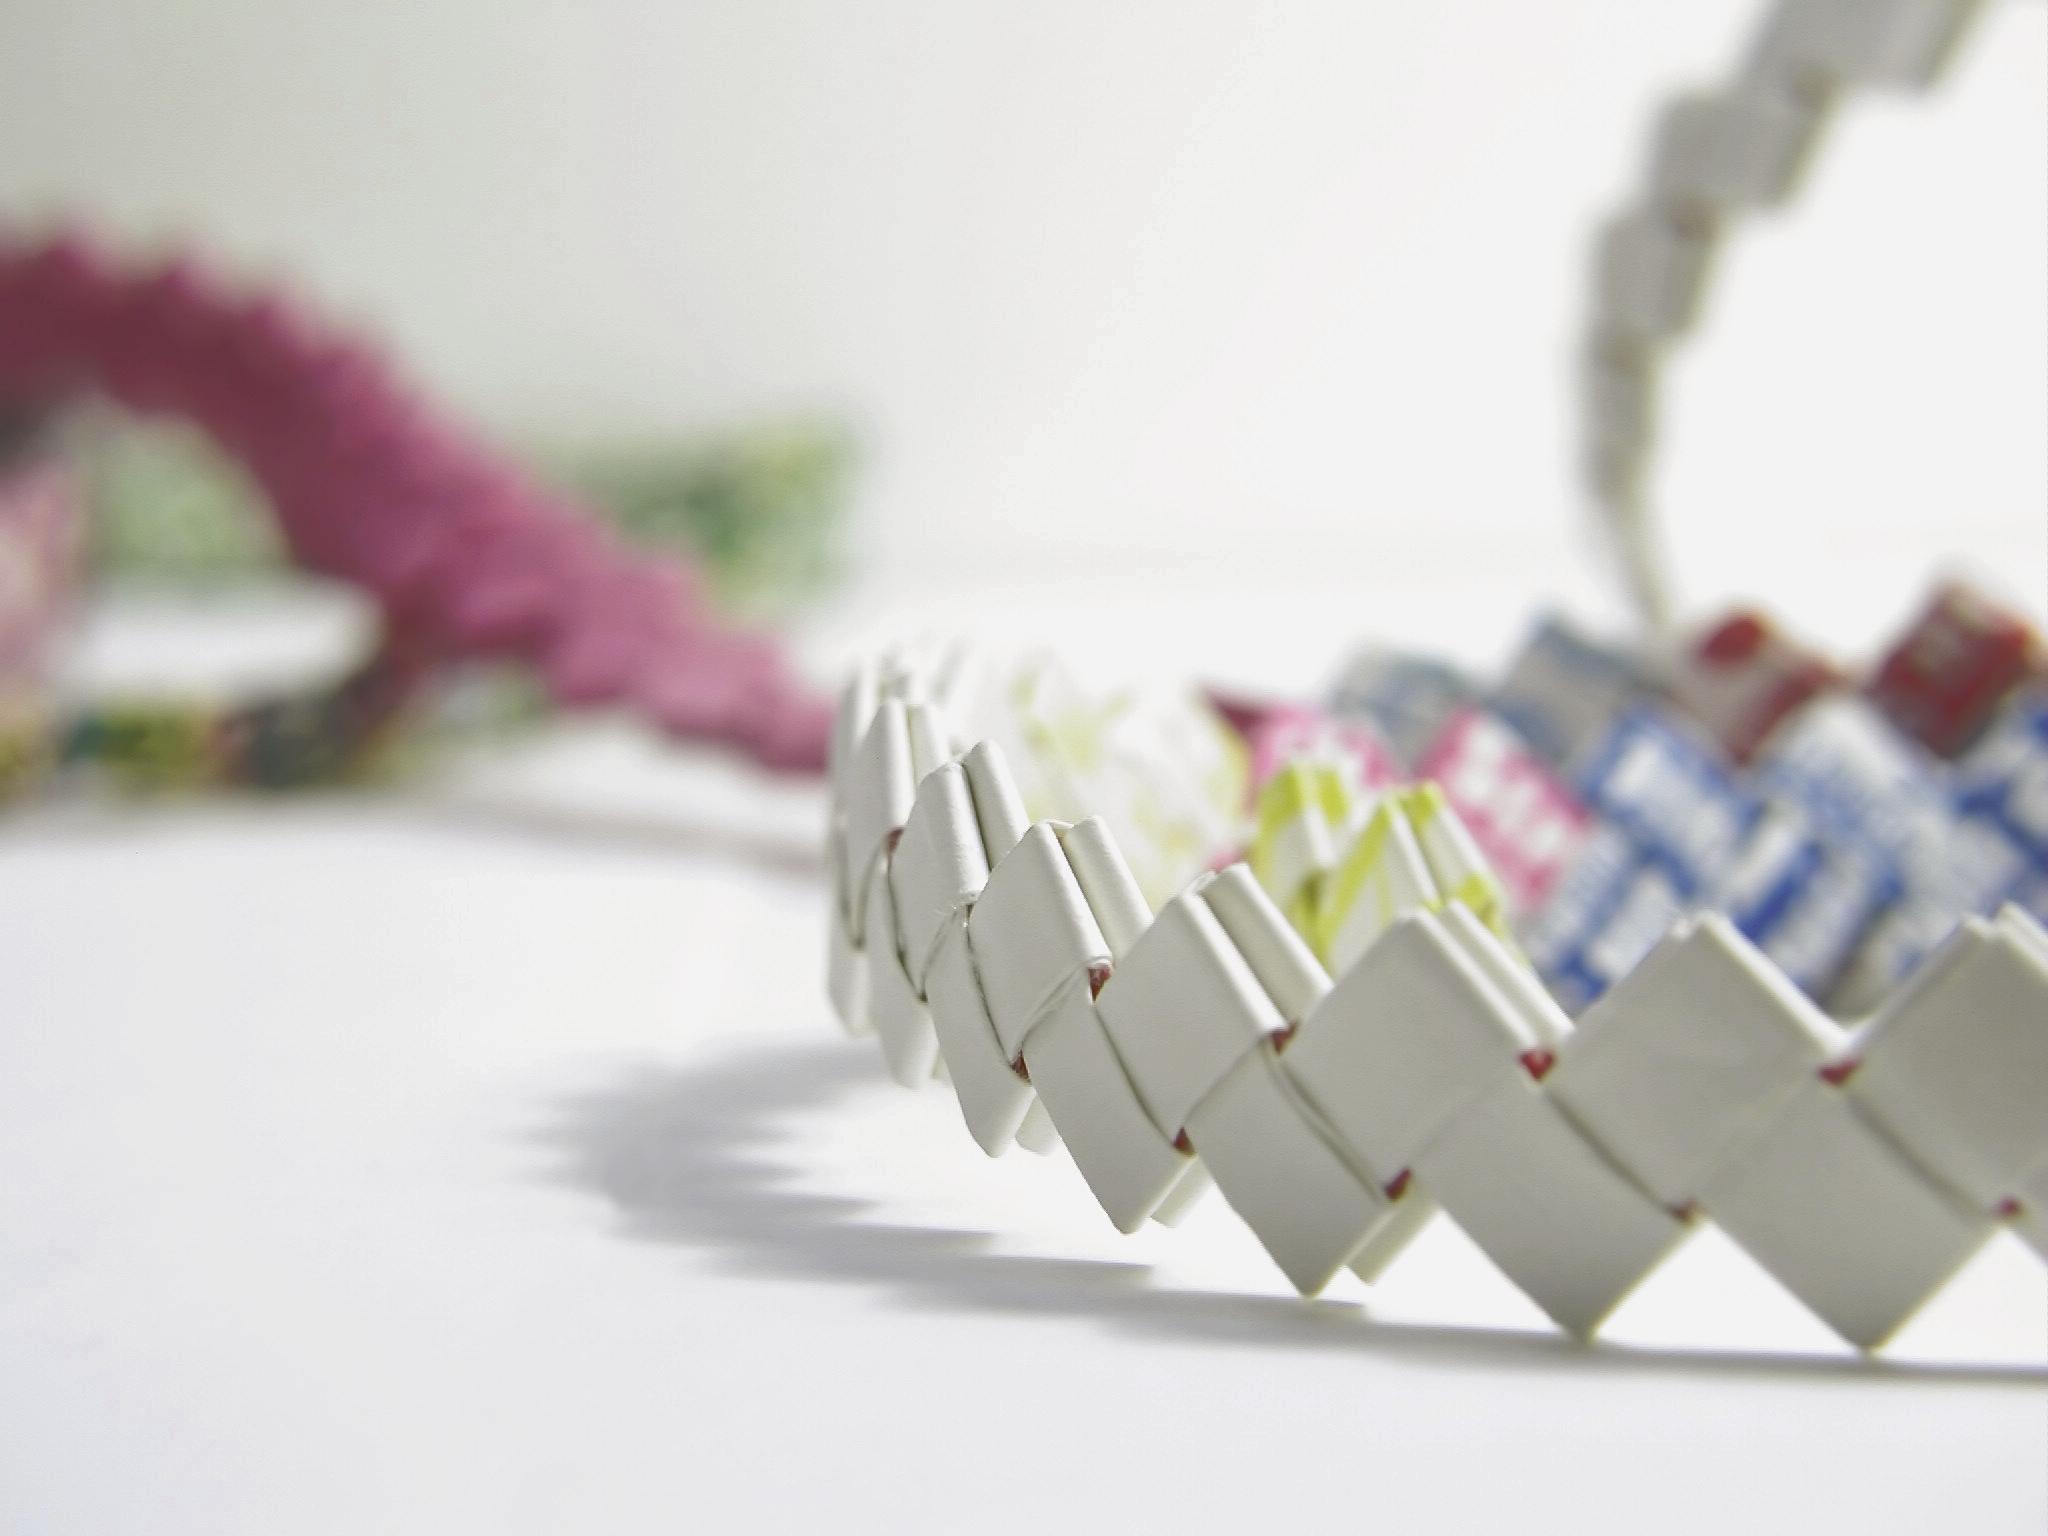 gumwrapper chain